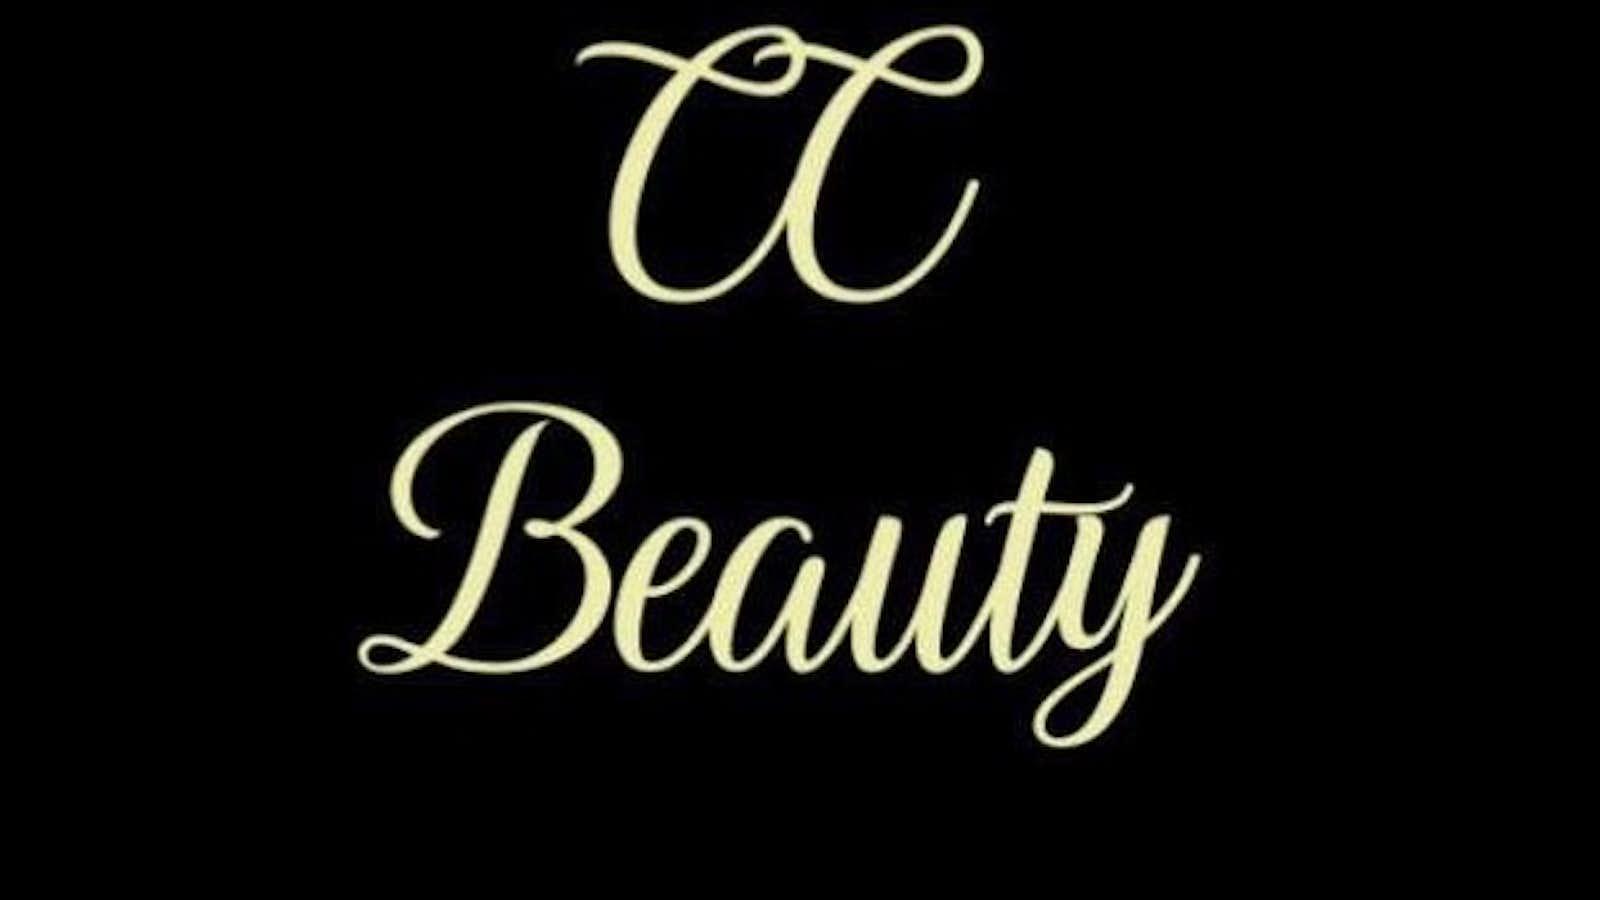 CC Beauty within VIP Salon